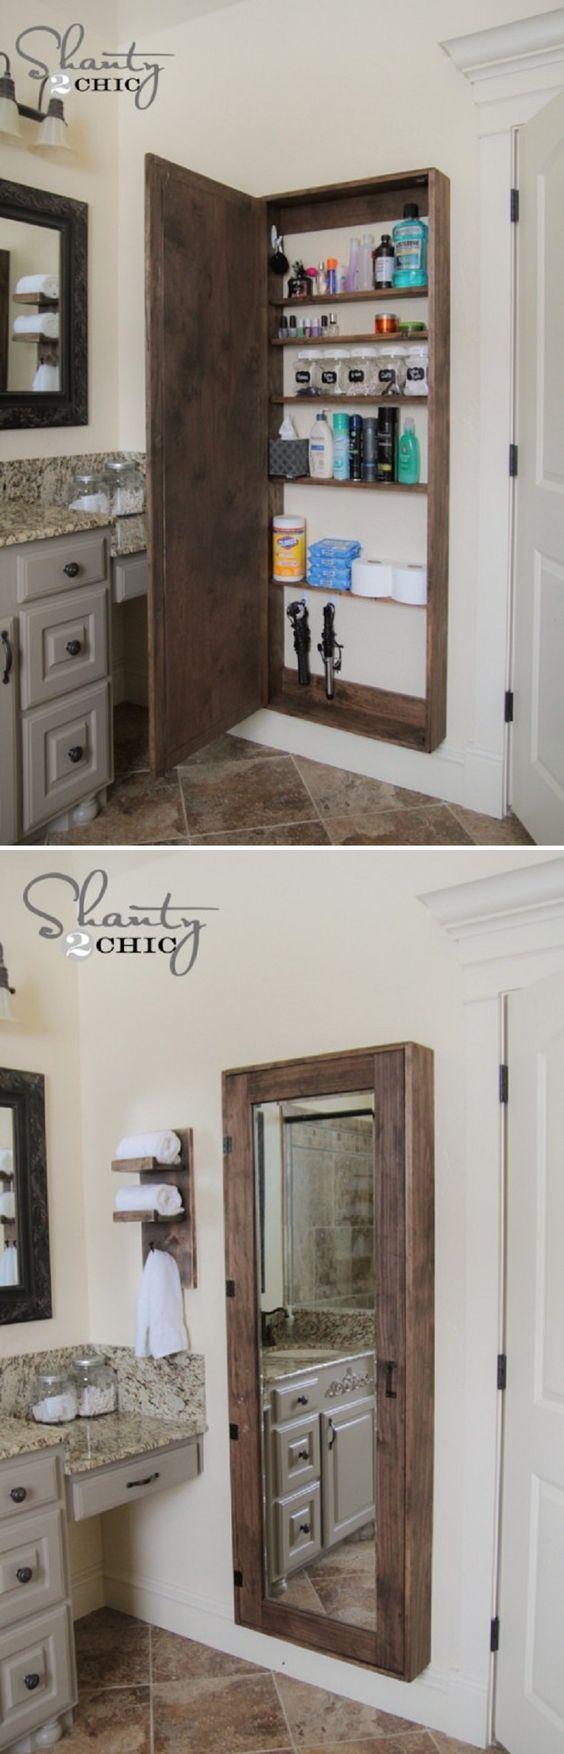 DIY Bathroom mirror storage case that holds everything. - 17 Repurposed DIY Bathroom Storage Solutions | GleamItUp